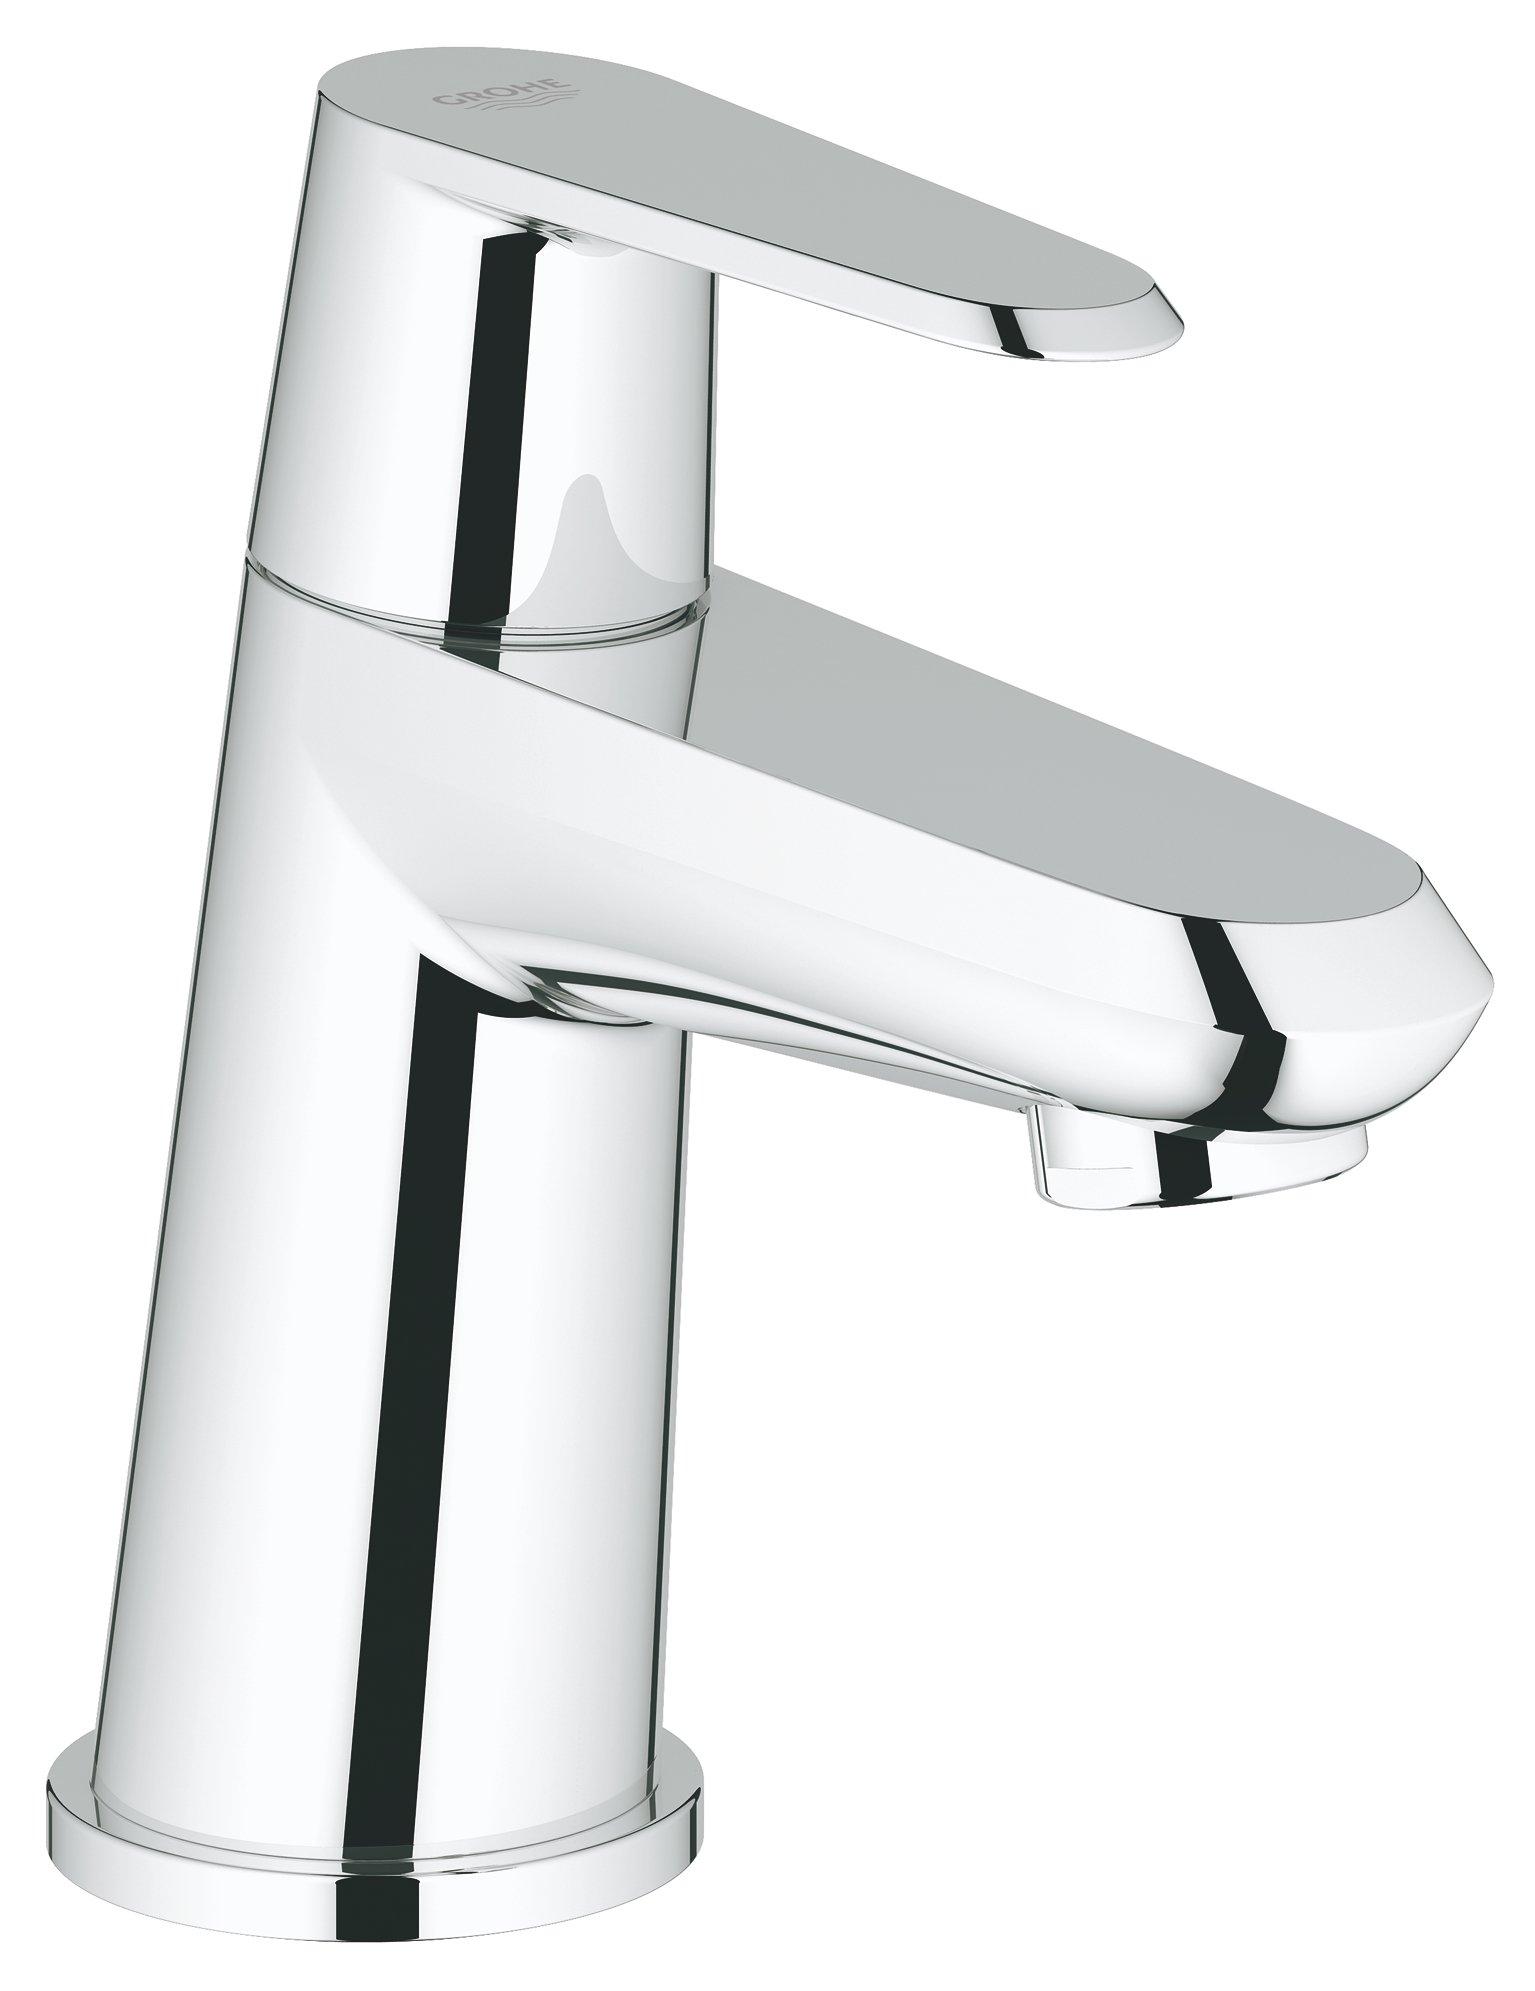 Grohe Eurodisc Cosmopolitan toiletkraan XS, chroom